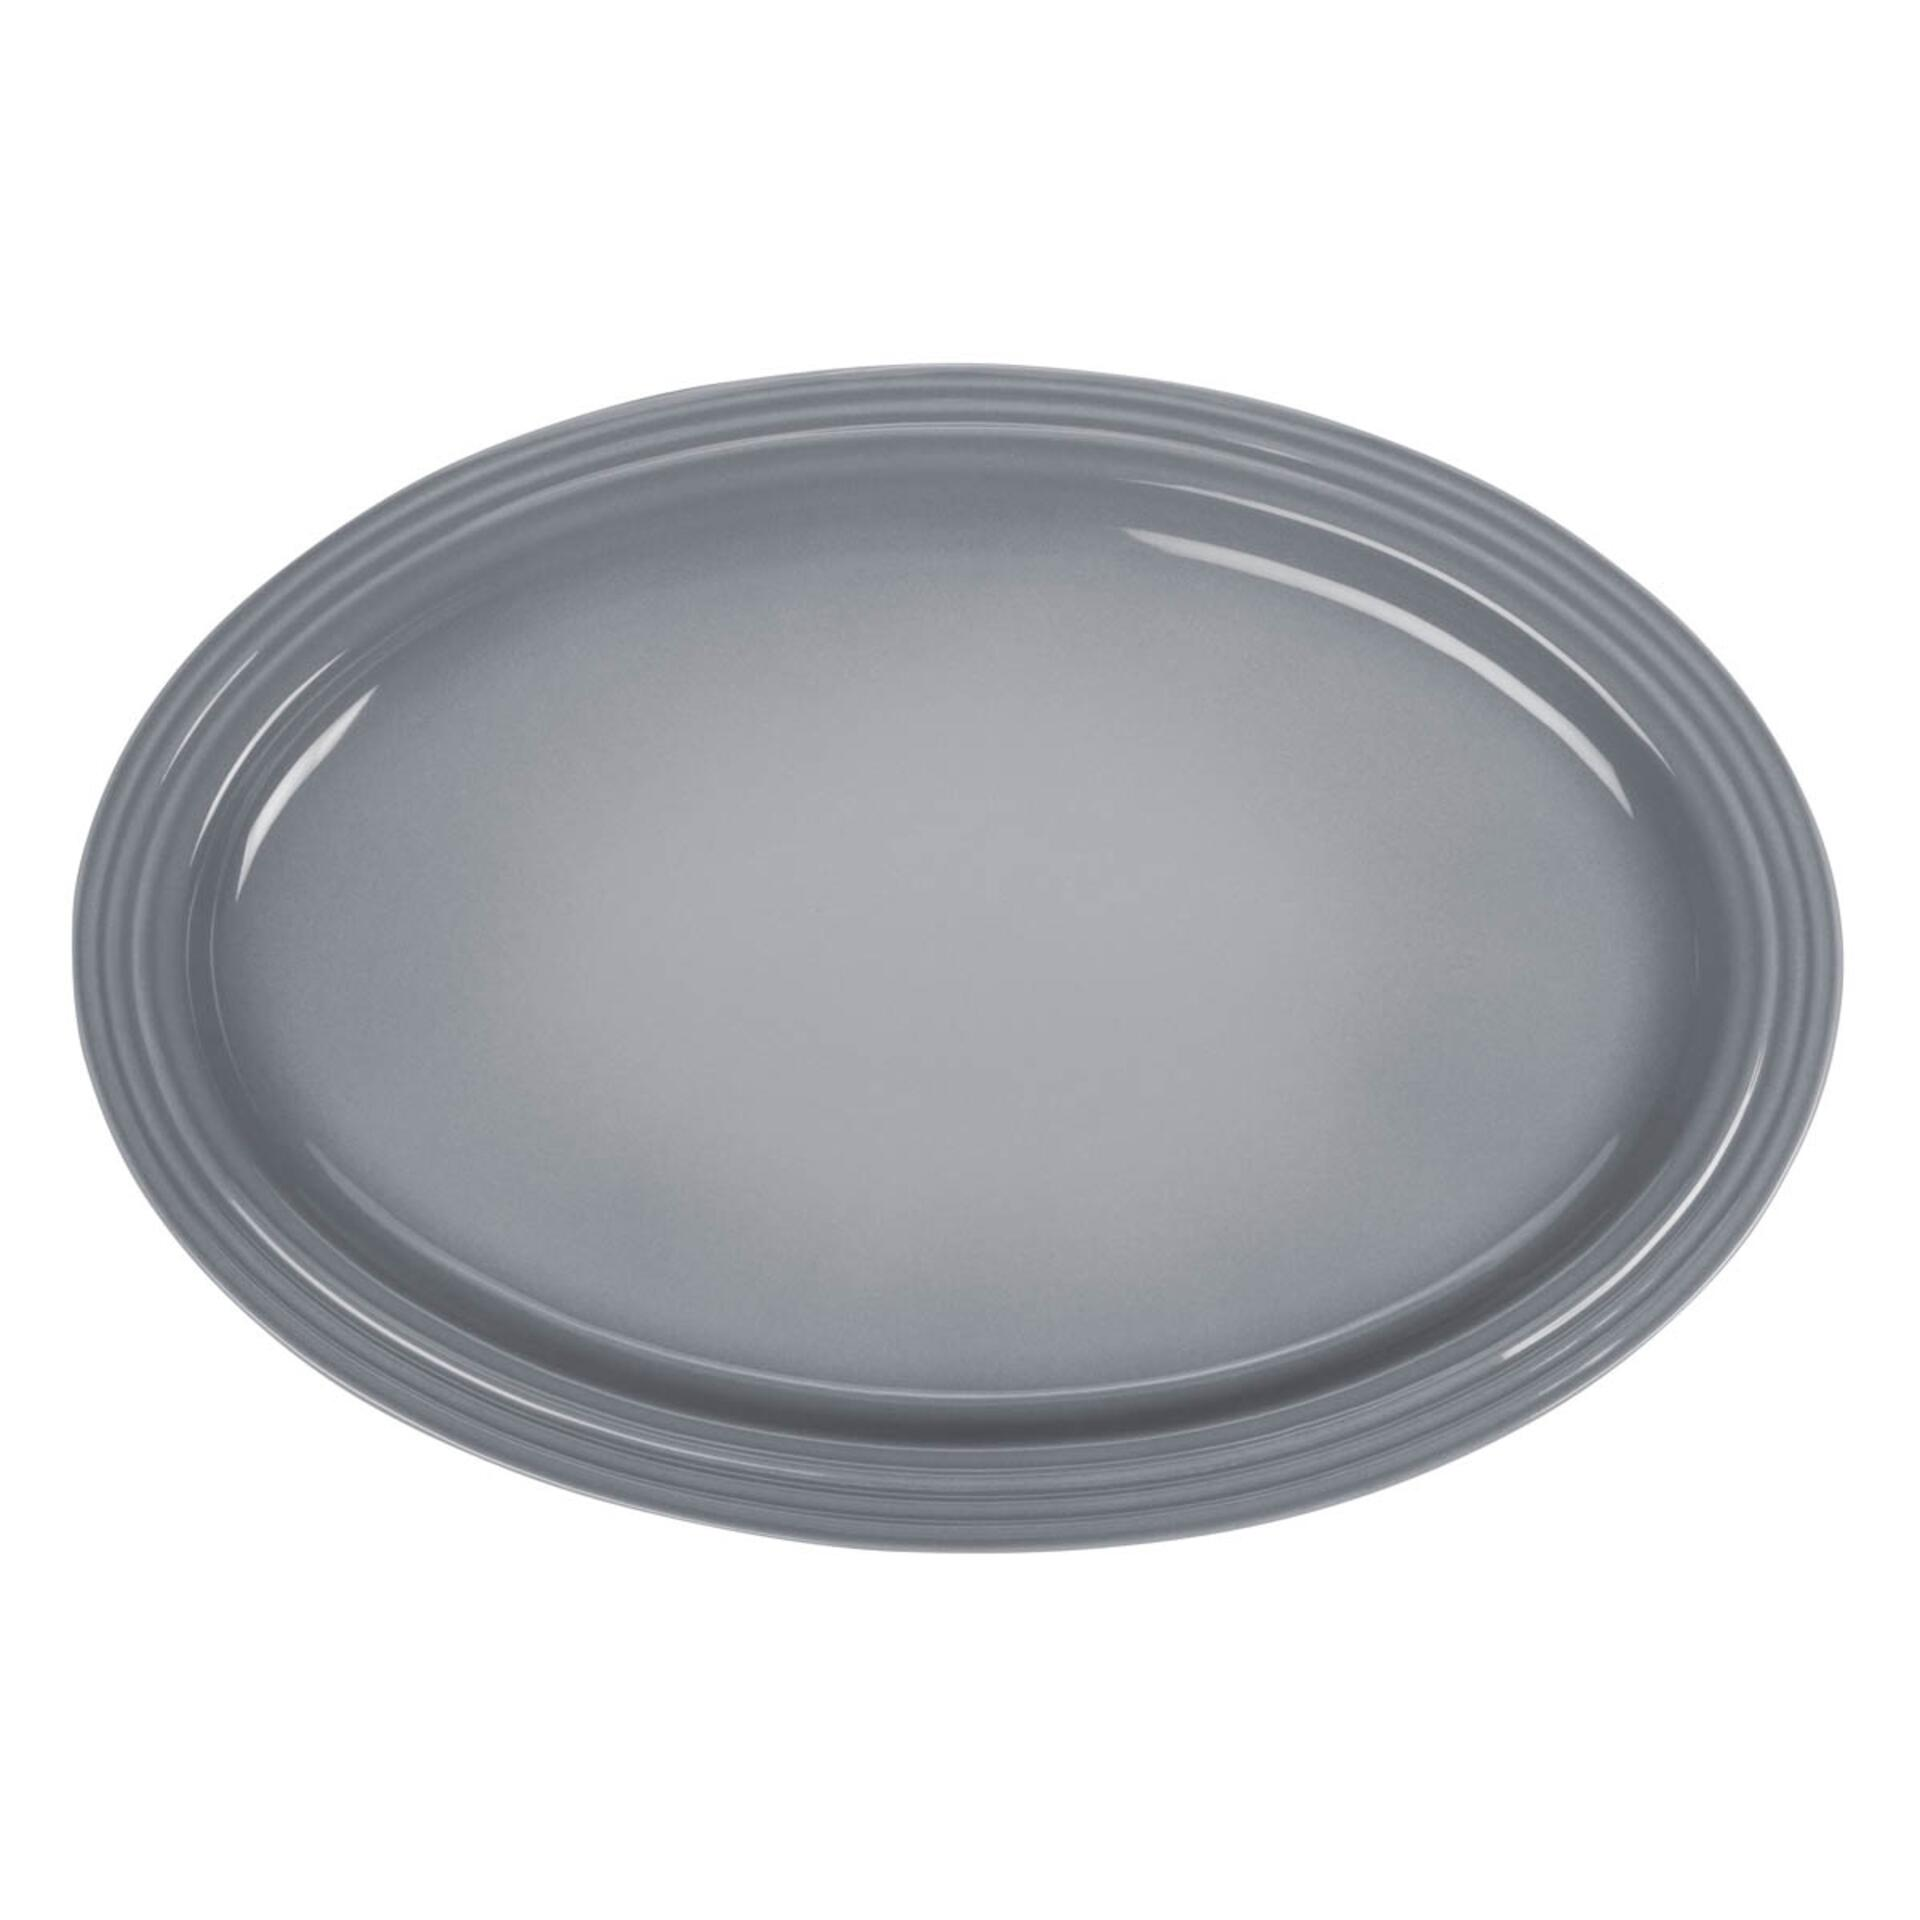 Le Creuset Servierplatte oval 46 cm Perlgrau